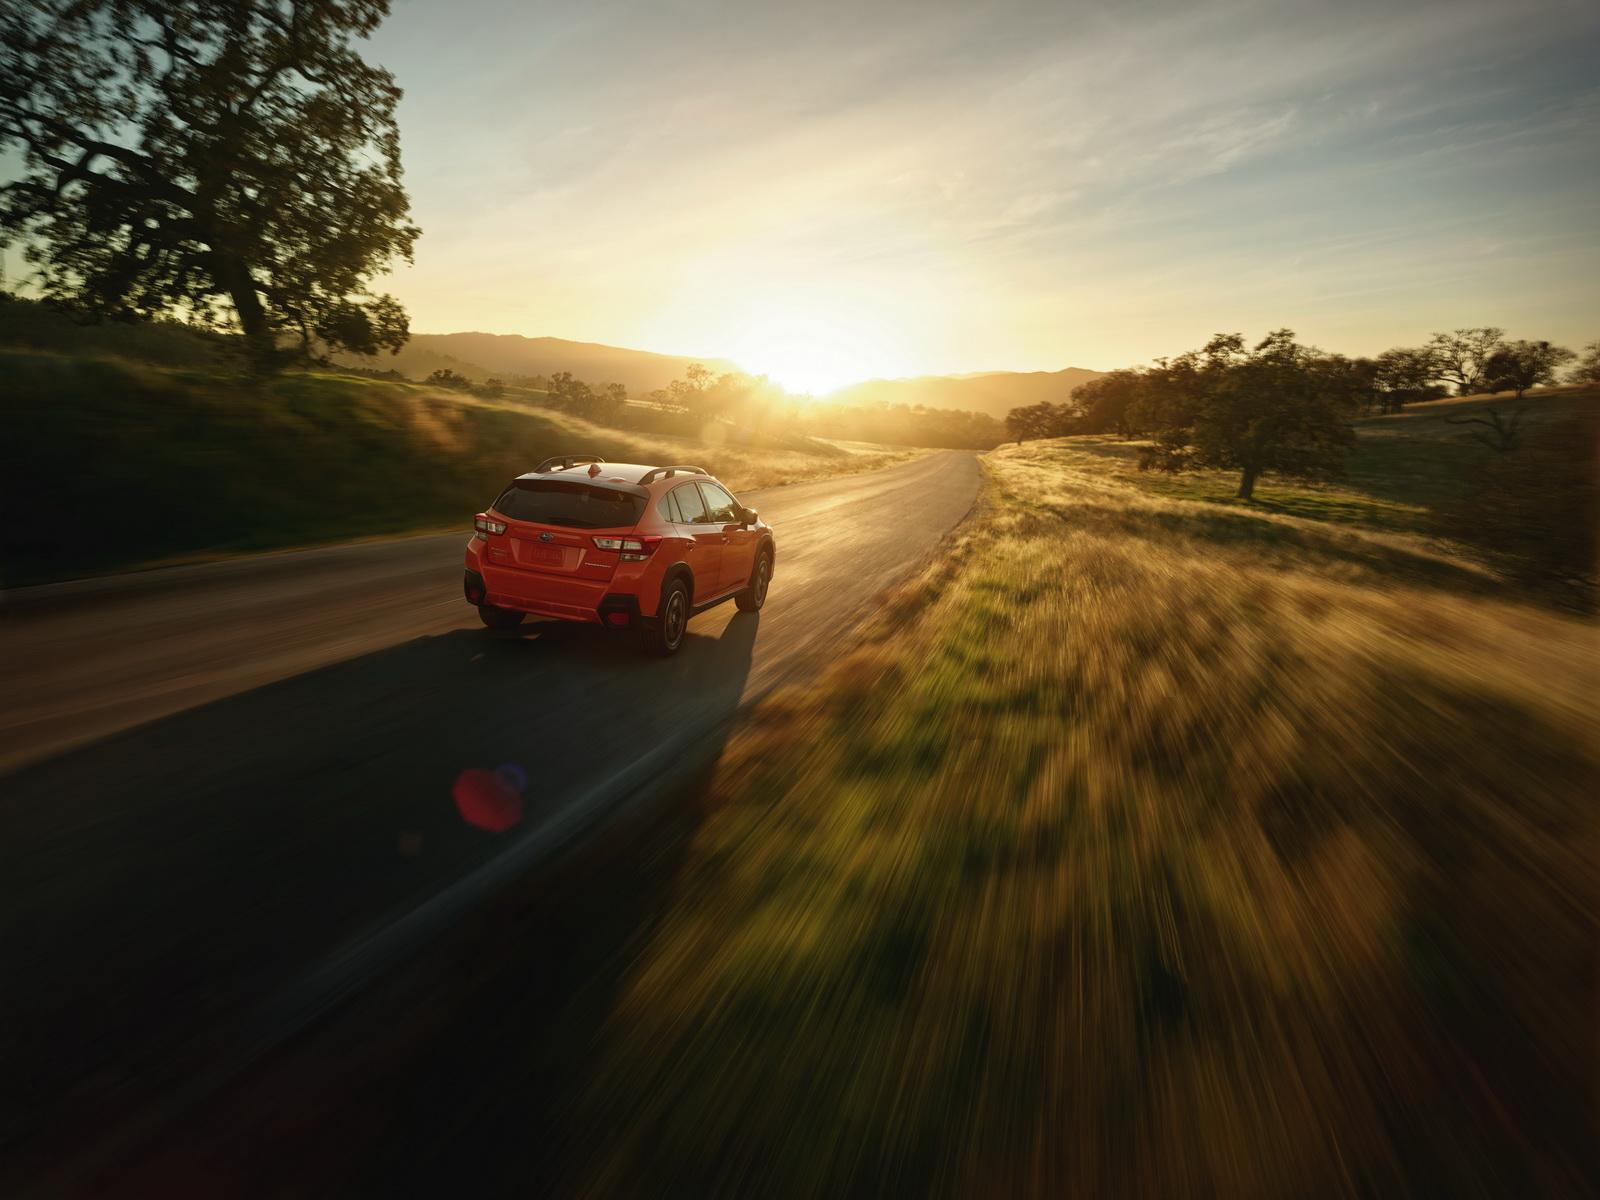 Subaru Prices All New 2018 Crosstrek From 21 795 30 Pics